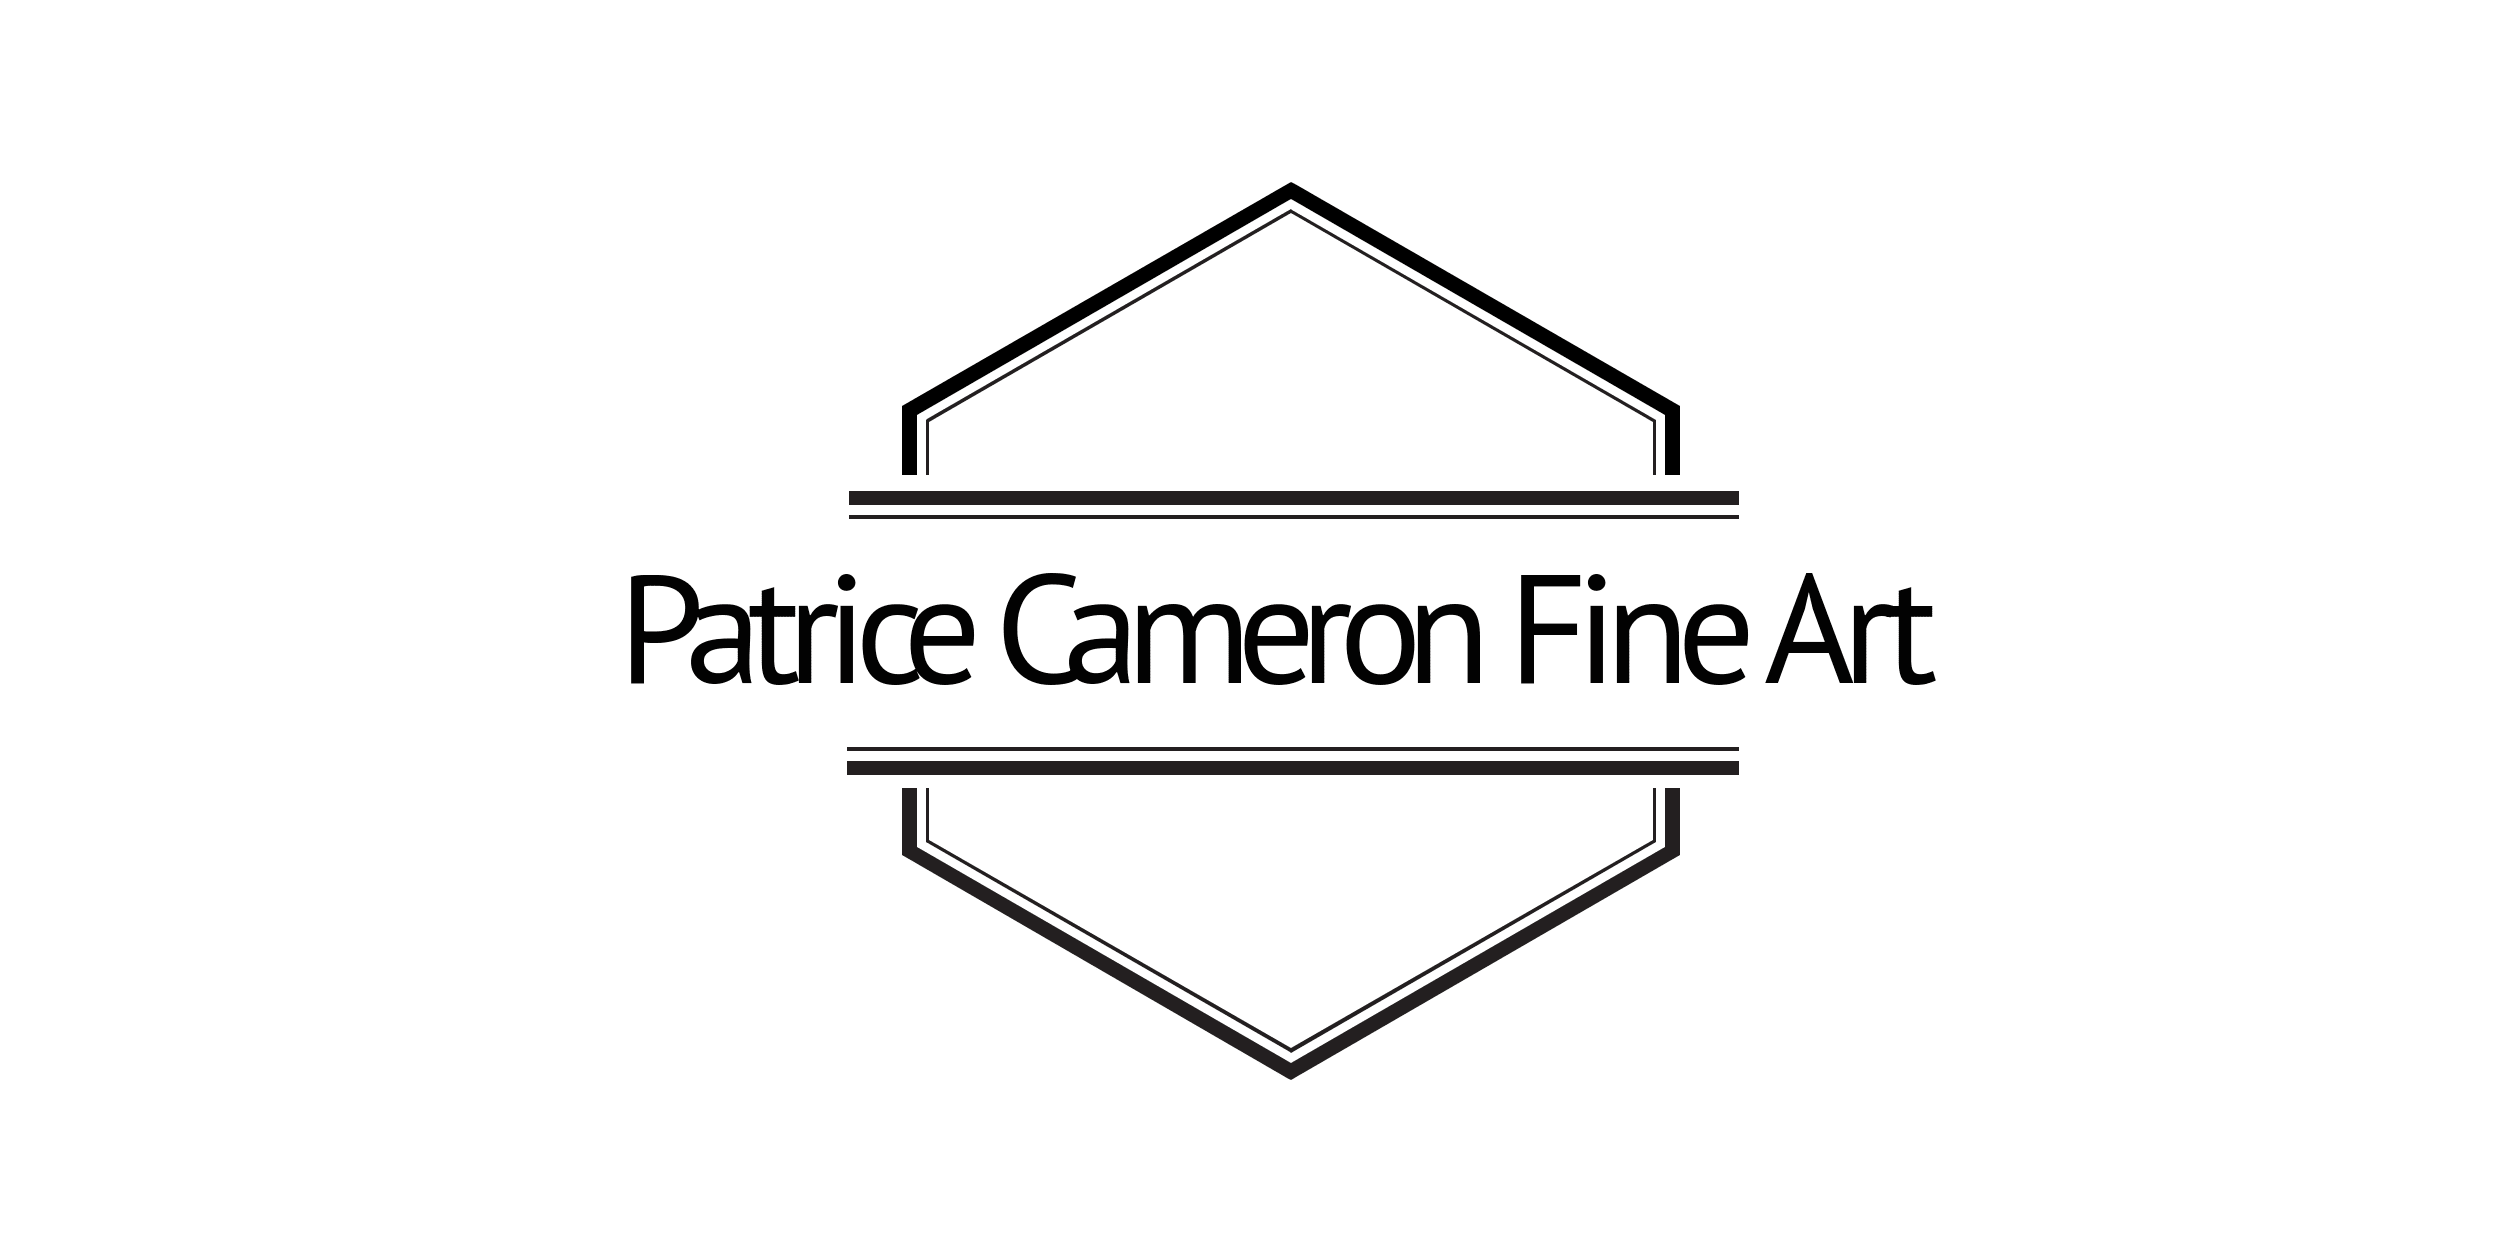 patrice cameron fine art